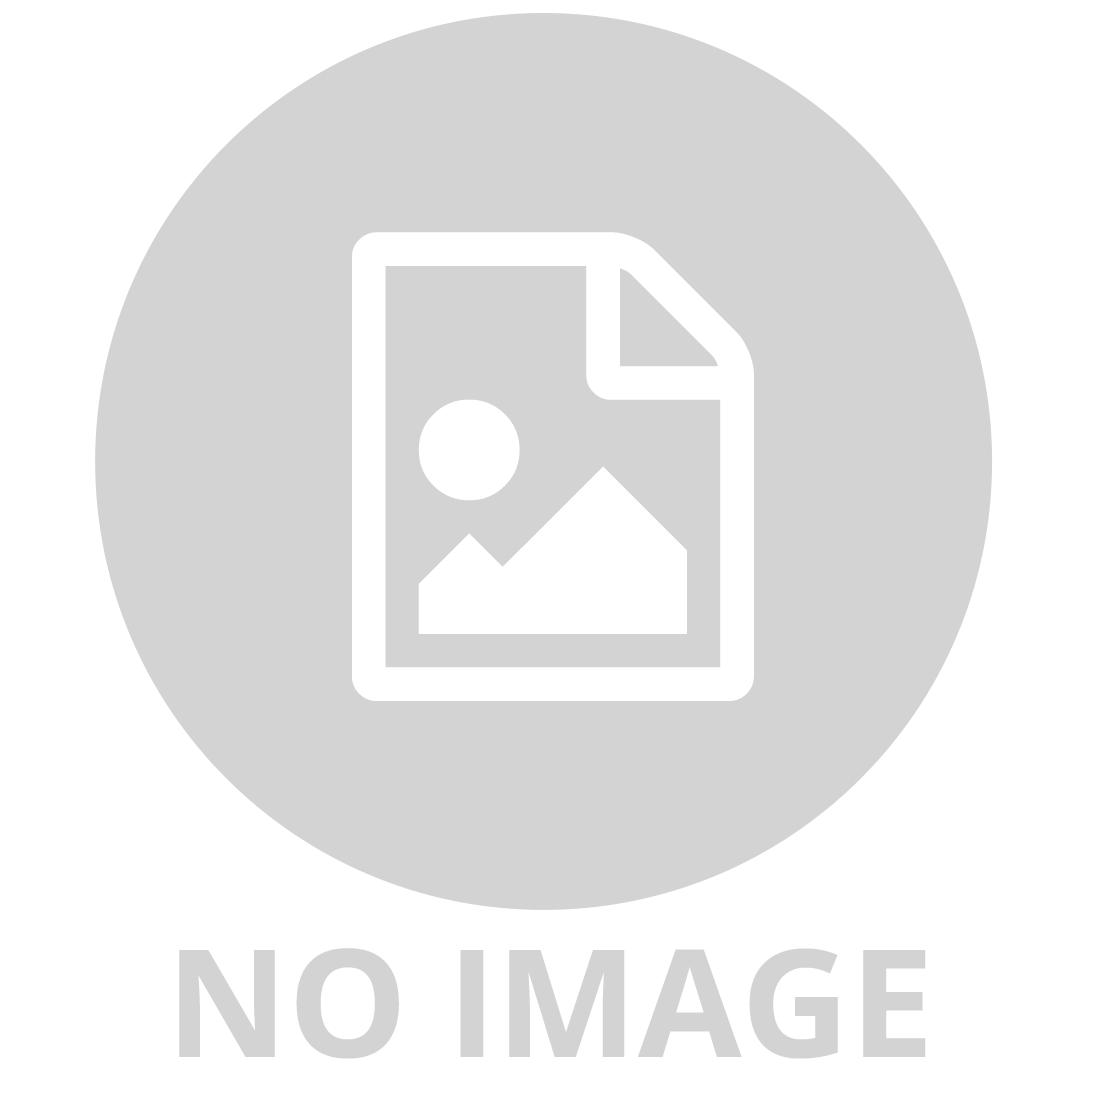 RAVENSBURGER 35 PCE PUZZLE ANIMAL KINGDOM